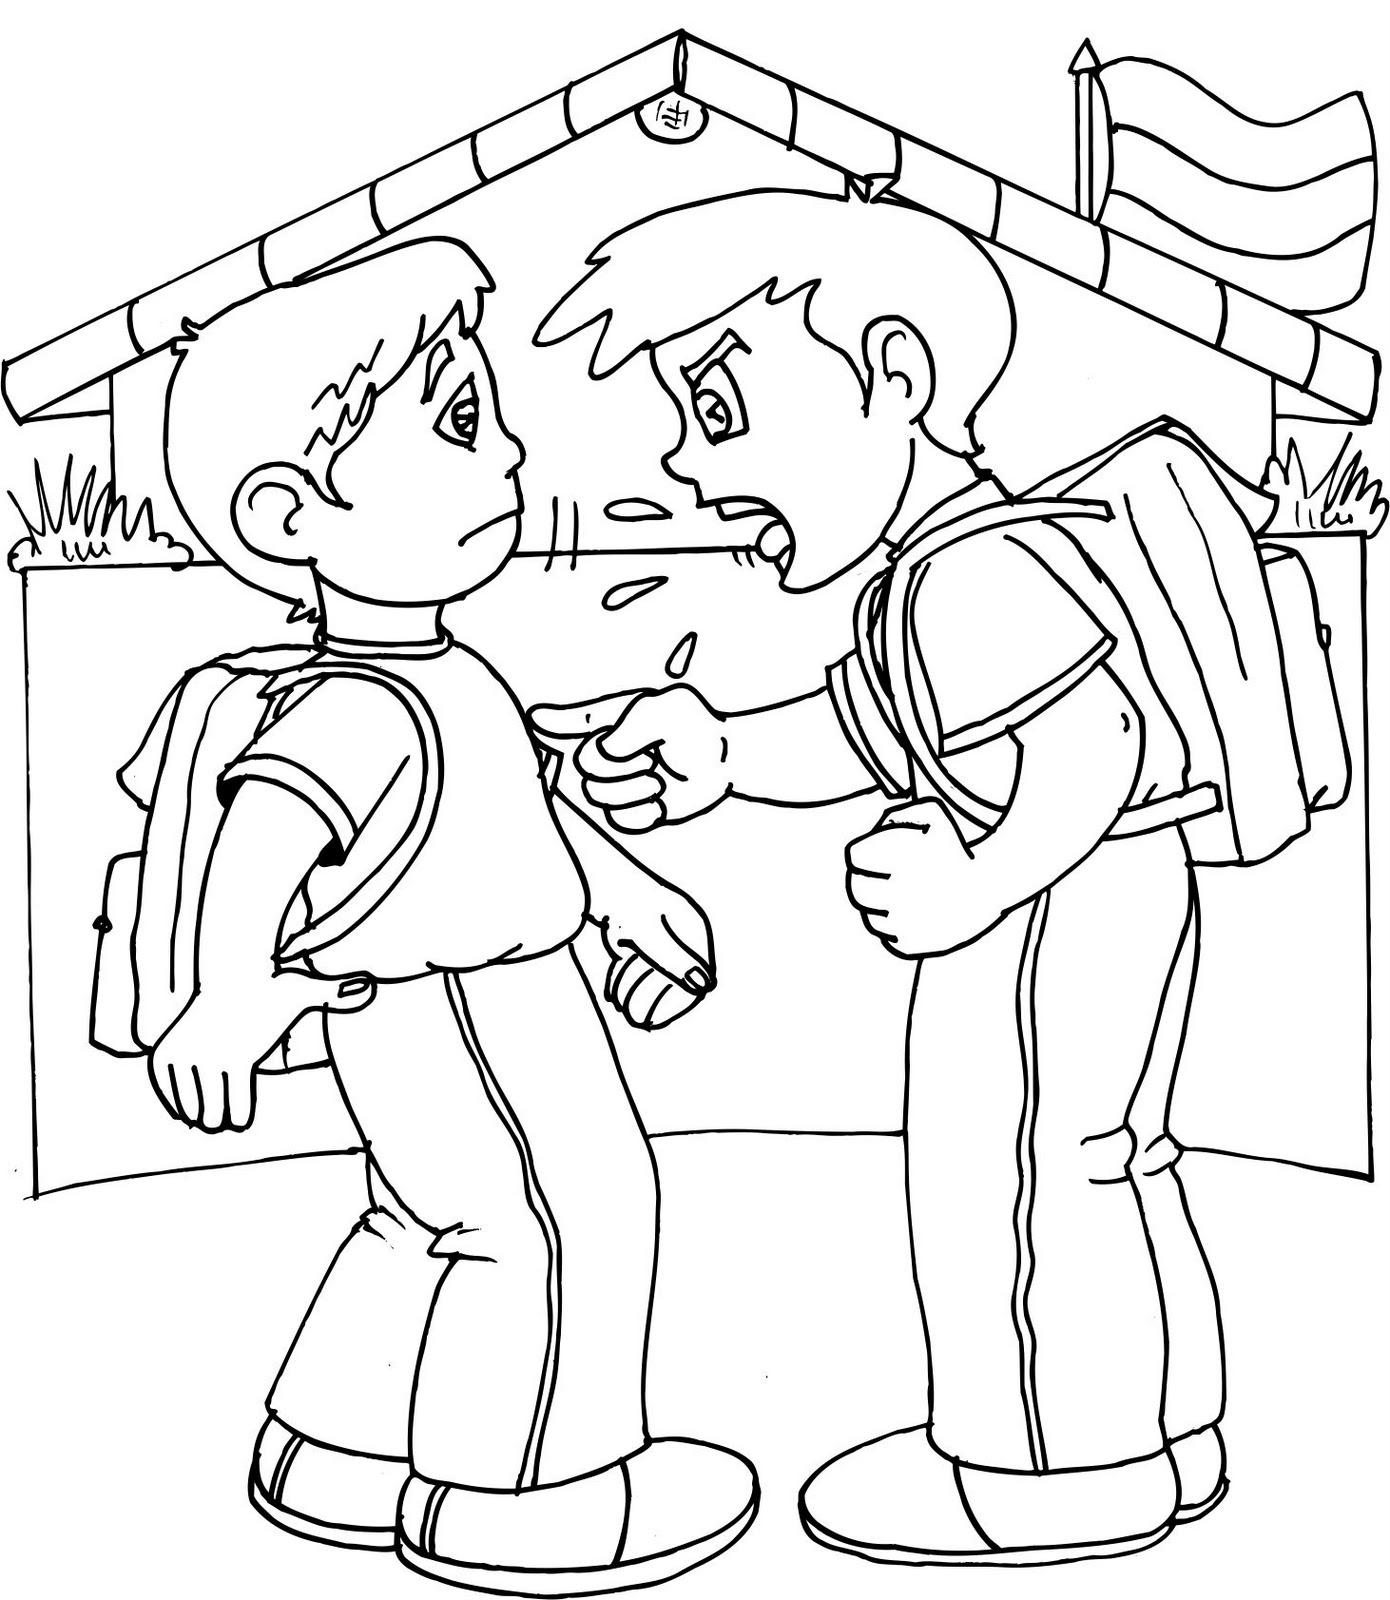 imagenes para colorear del bullying escolar imagui